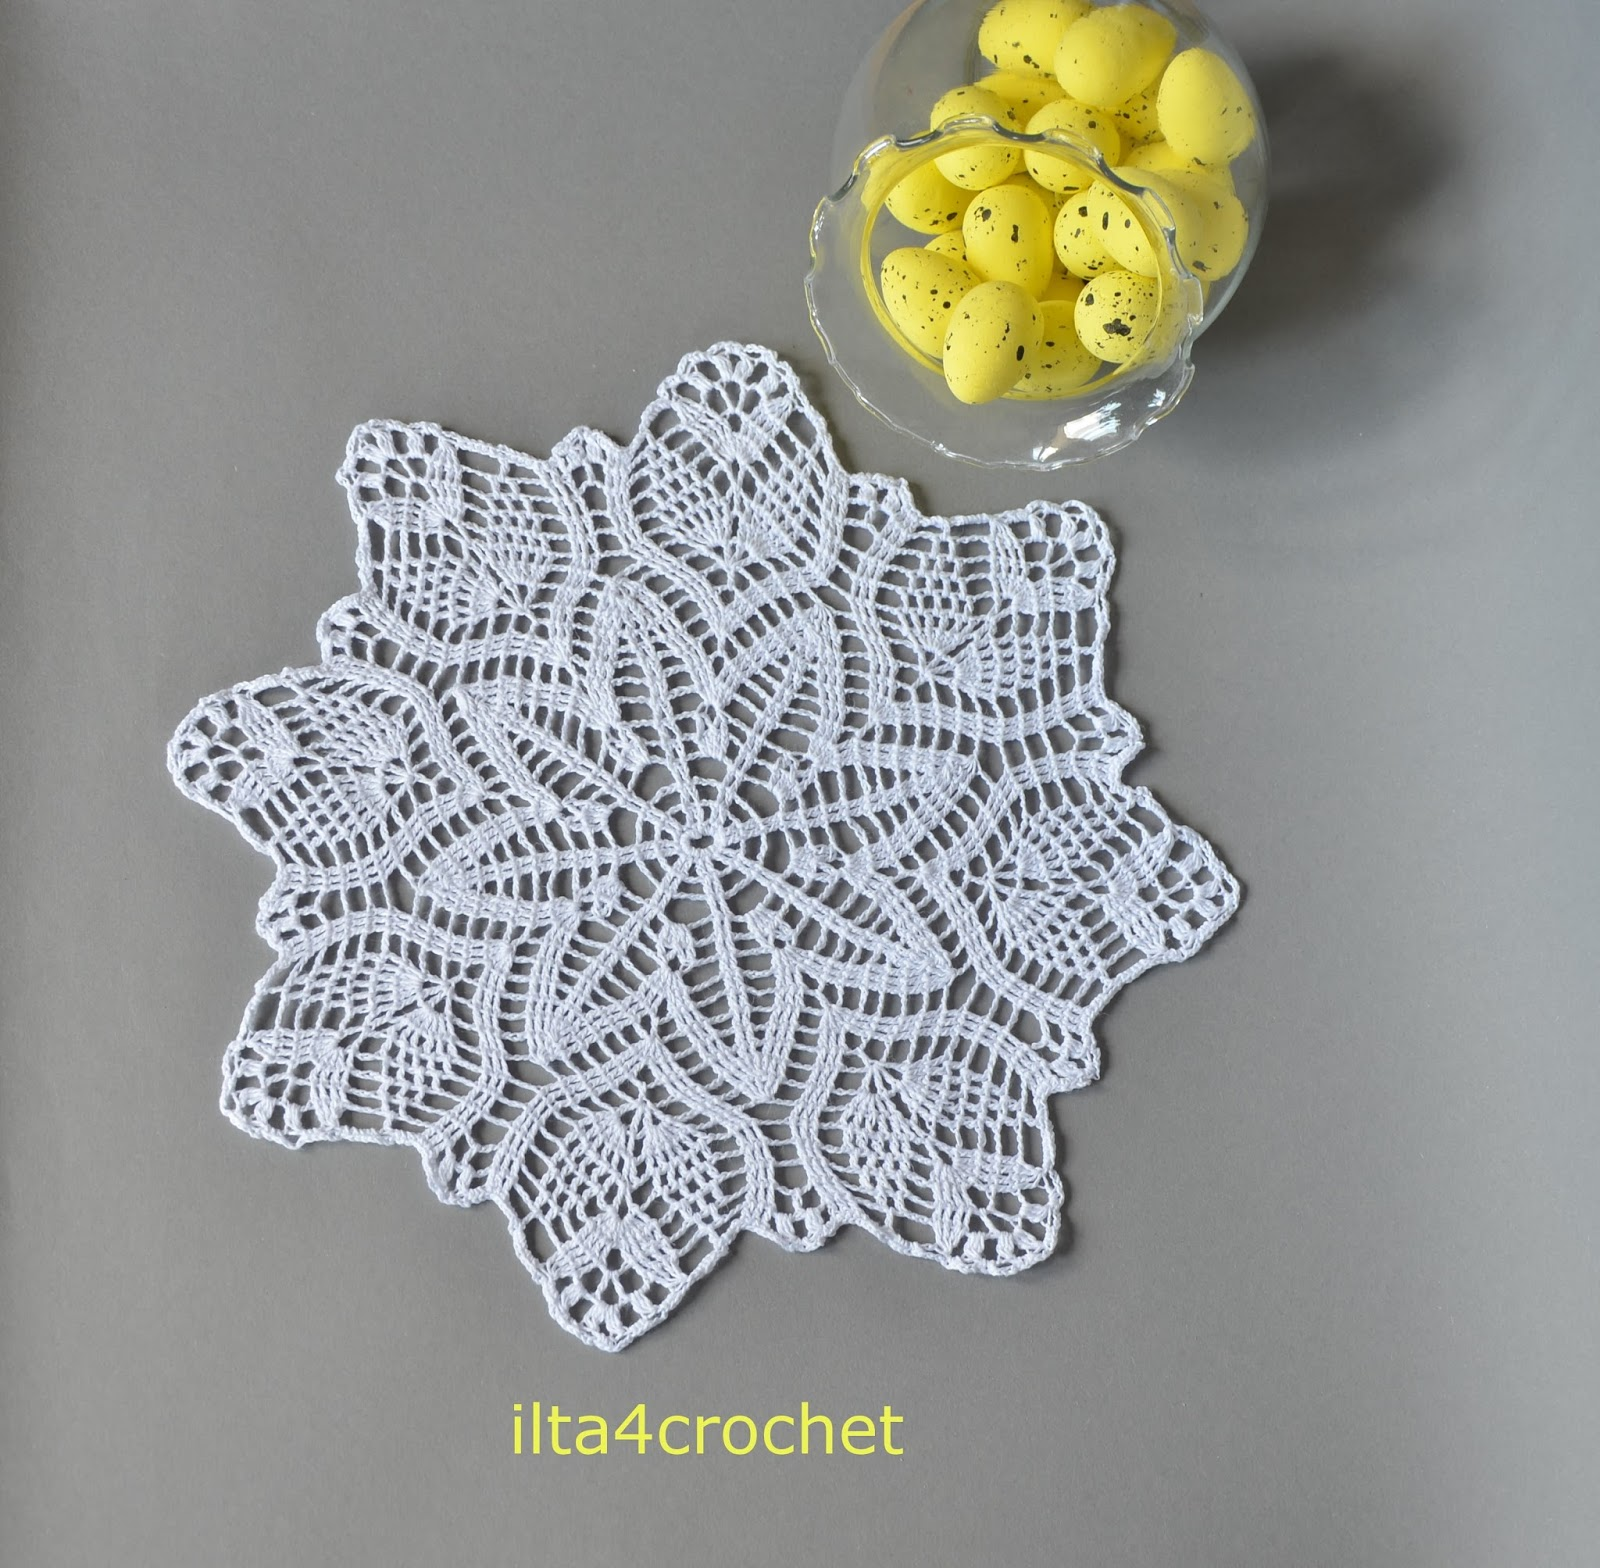 Zając(7) | Crochet decoration, Easter crafts, Holiday crochet | 1568x1600